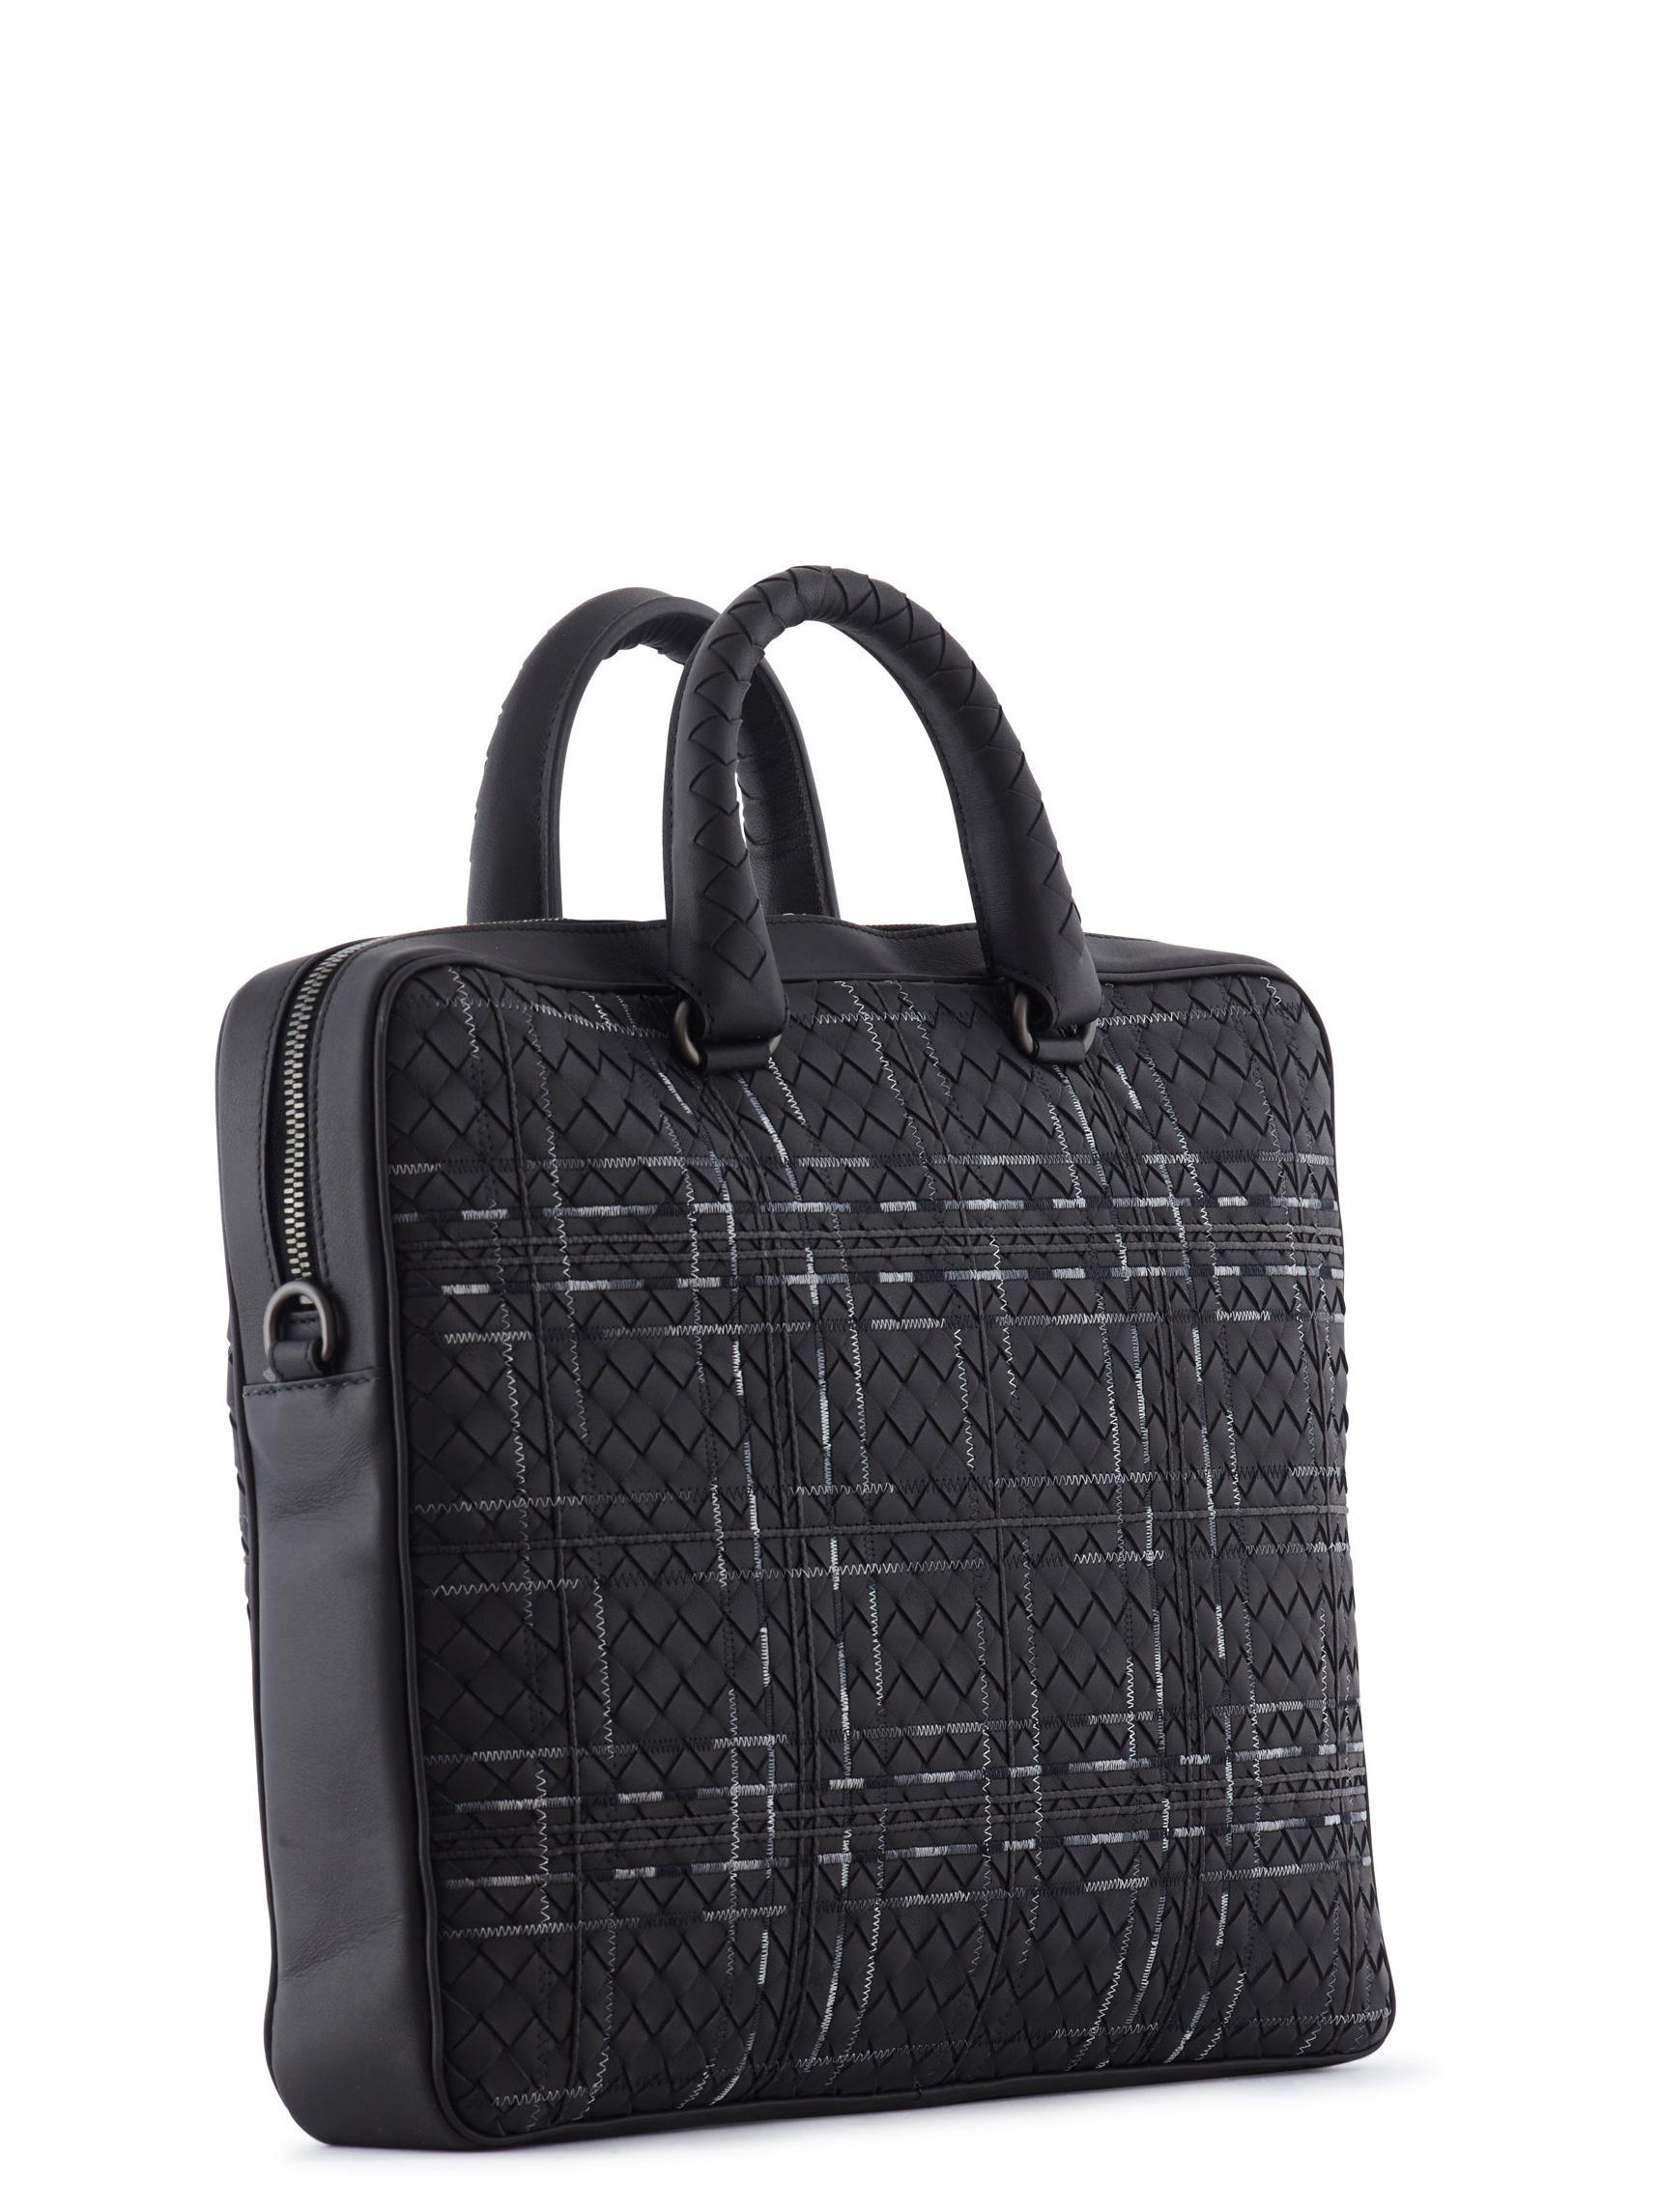 aaa7687b8787 Lyst - Bottega Veneta Metropolis Briefcase in Black for Men